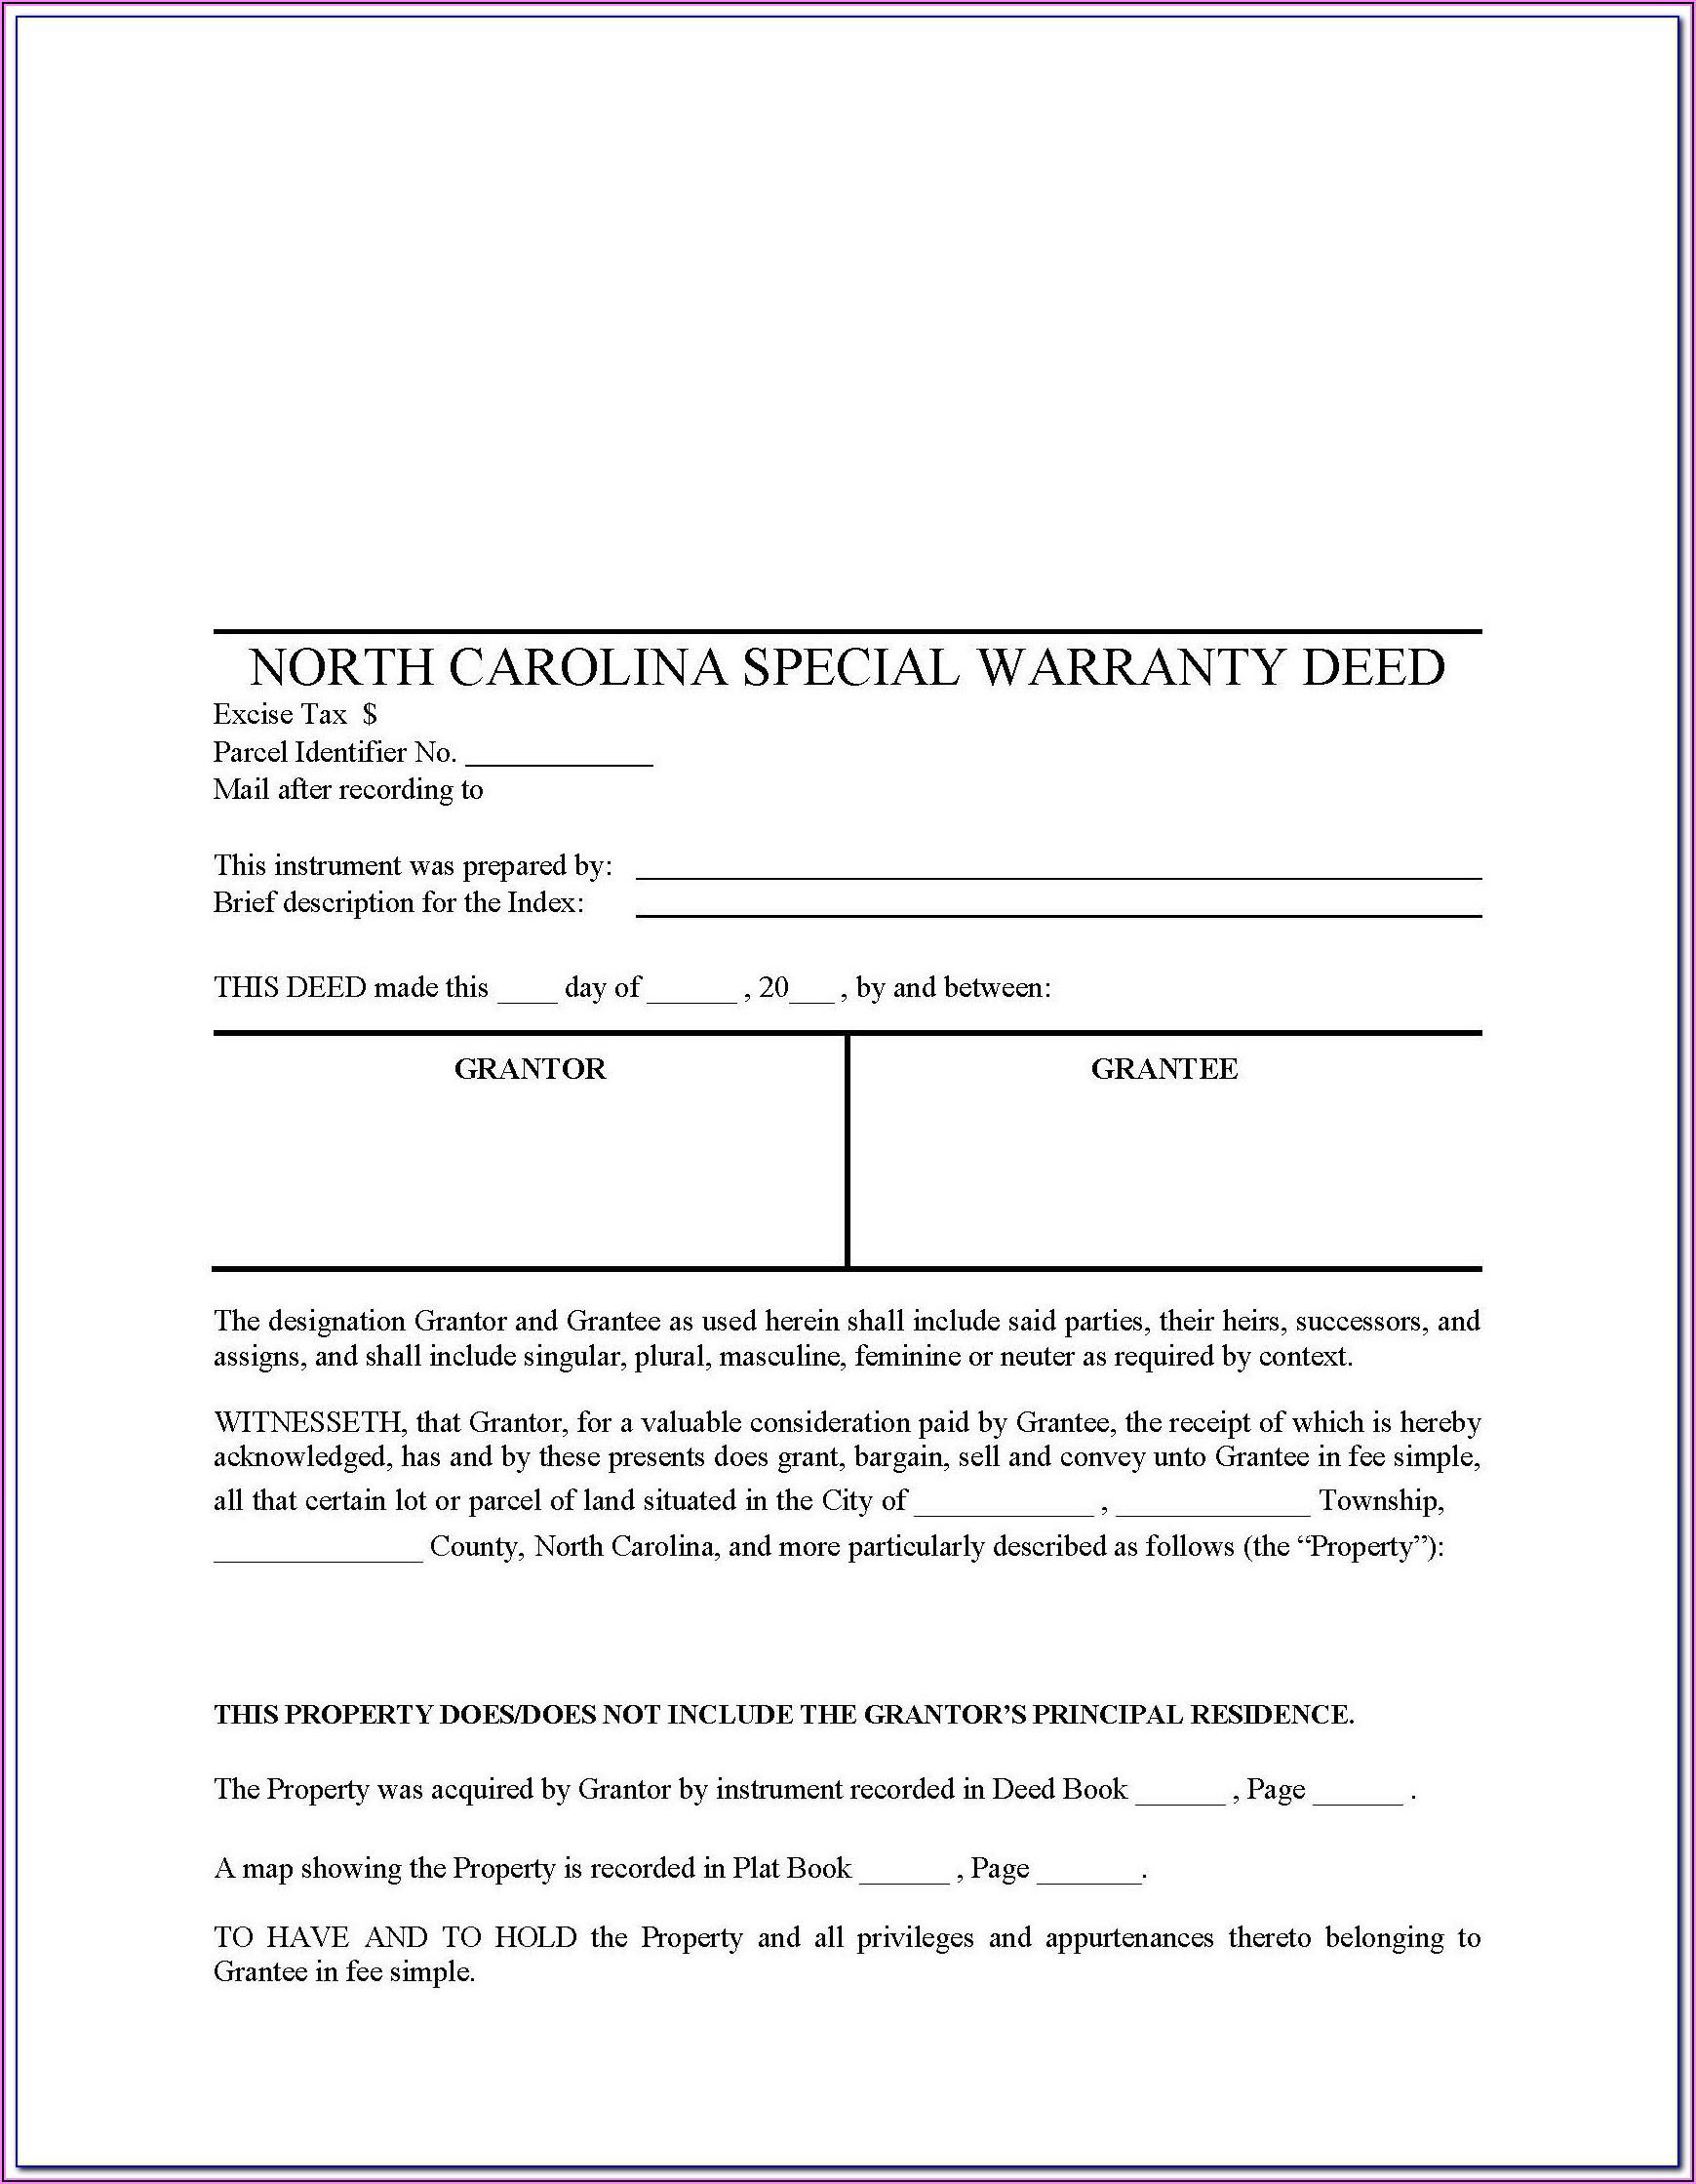 North Carolina Bar Association Special Warranty Deed Form